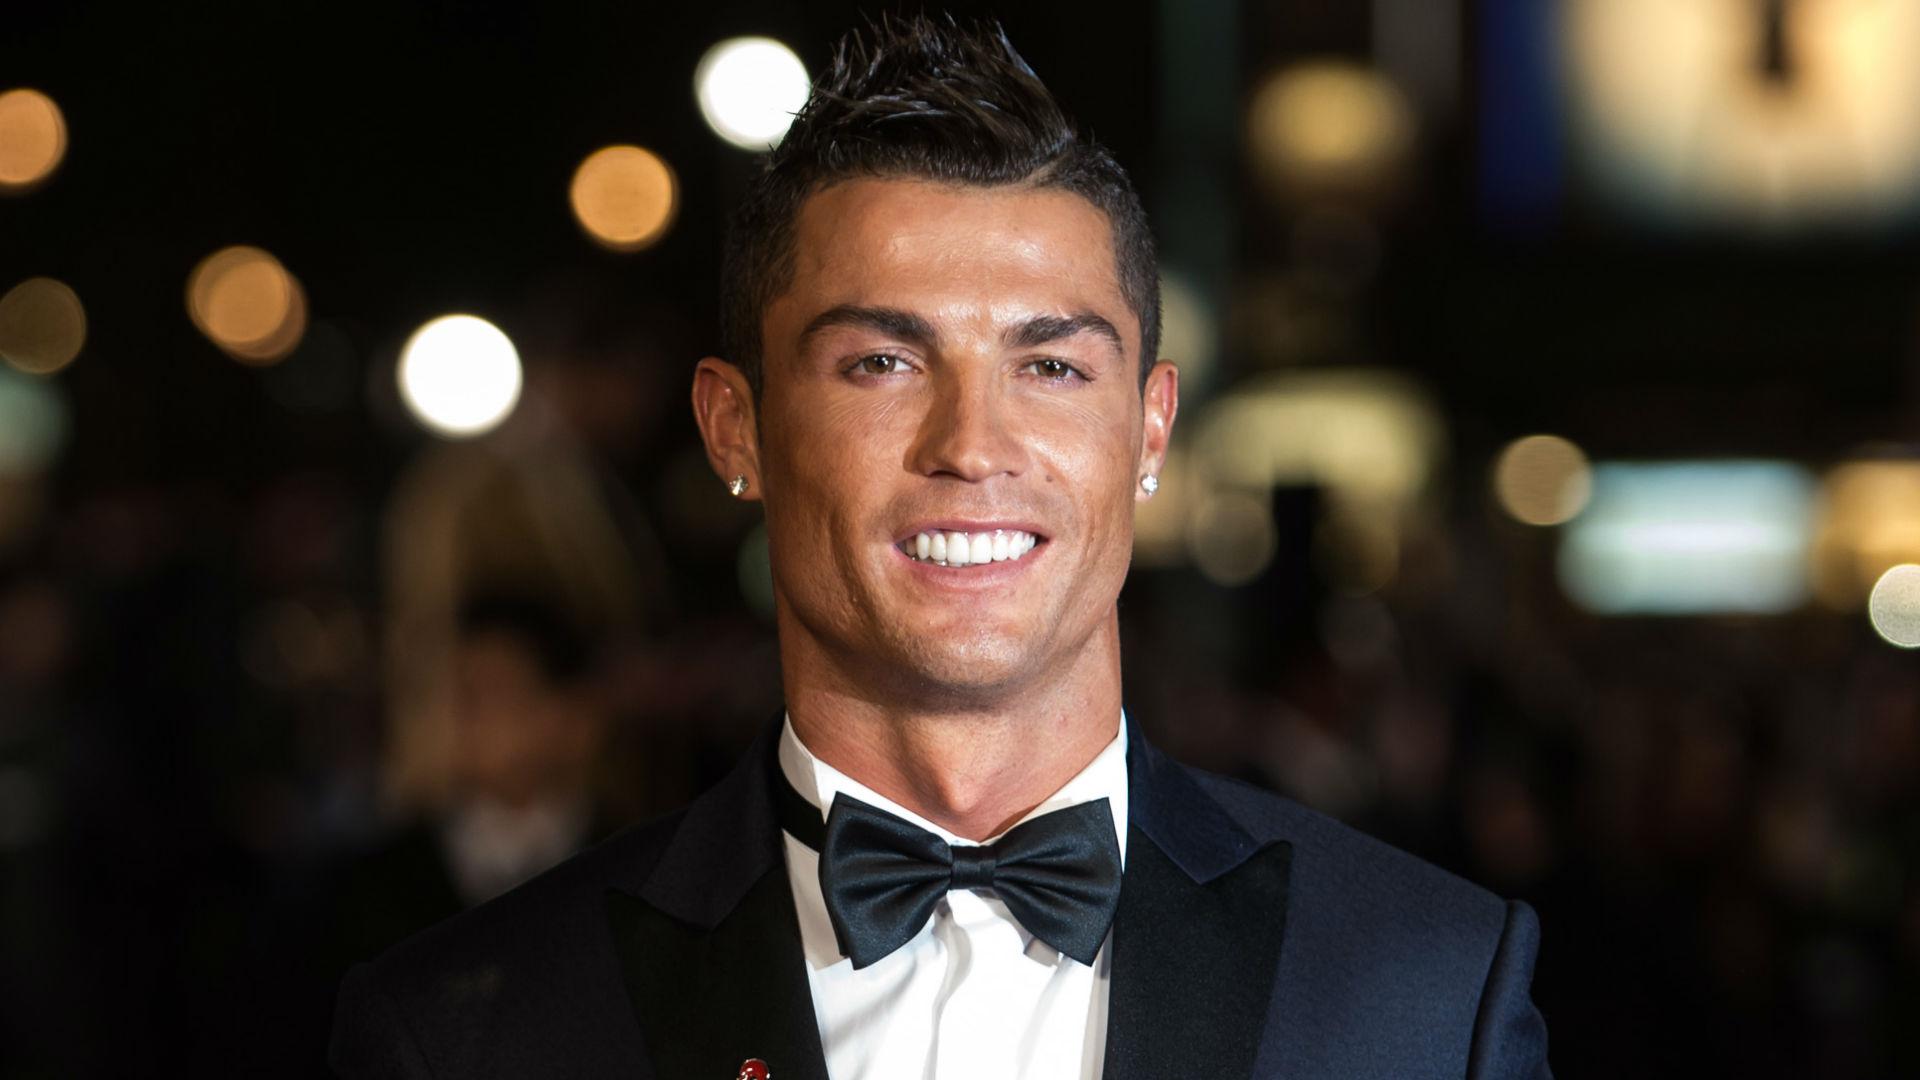 CR7 or 007? Ronaldo considering following Beckham and Cantona into films